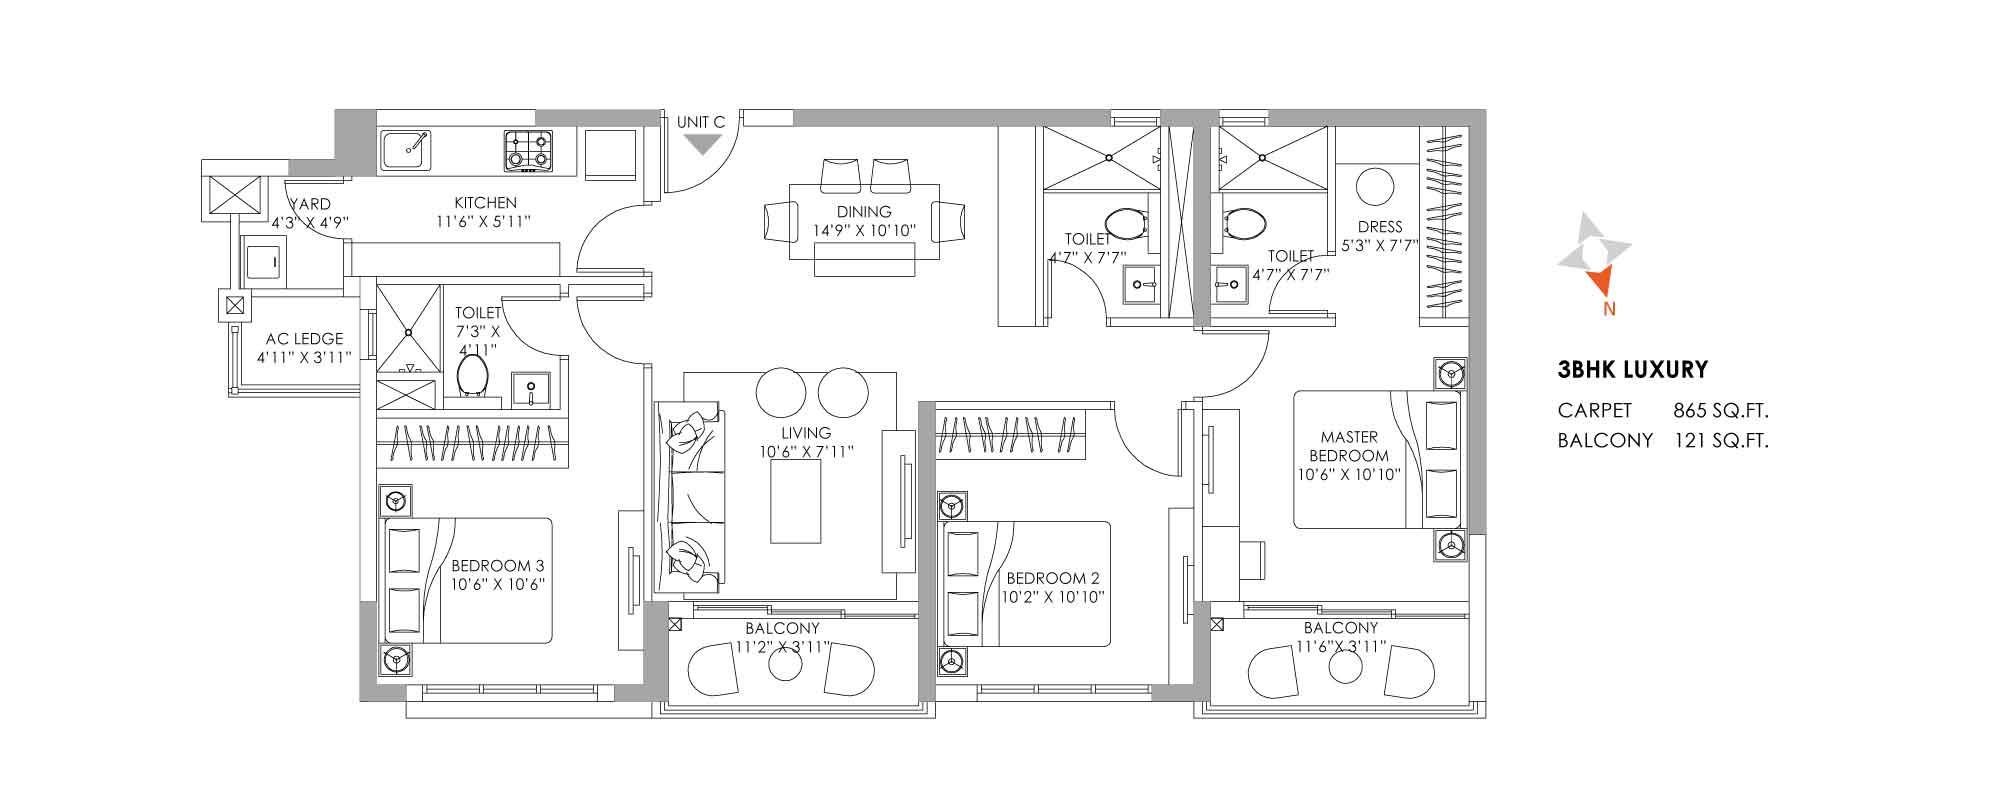 One10 Unit Plan Luxury 865 SQFT